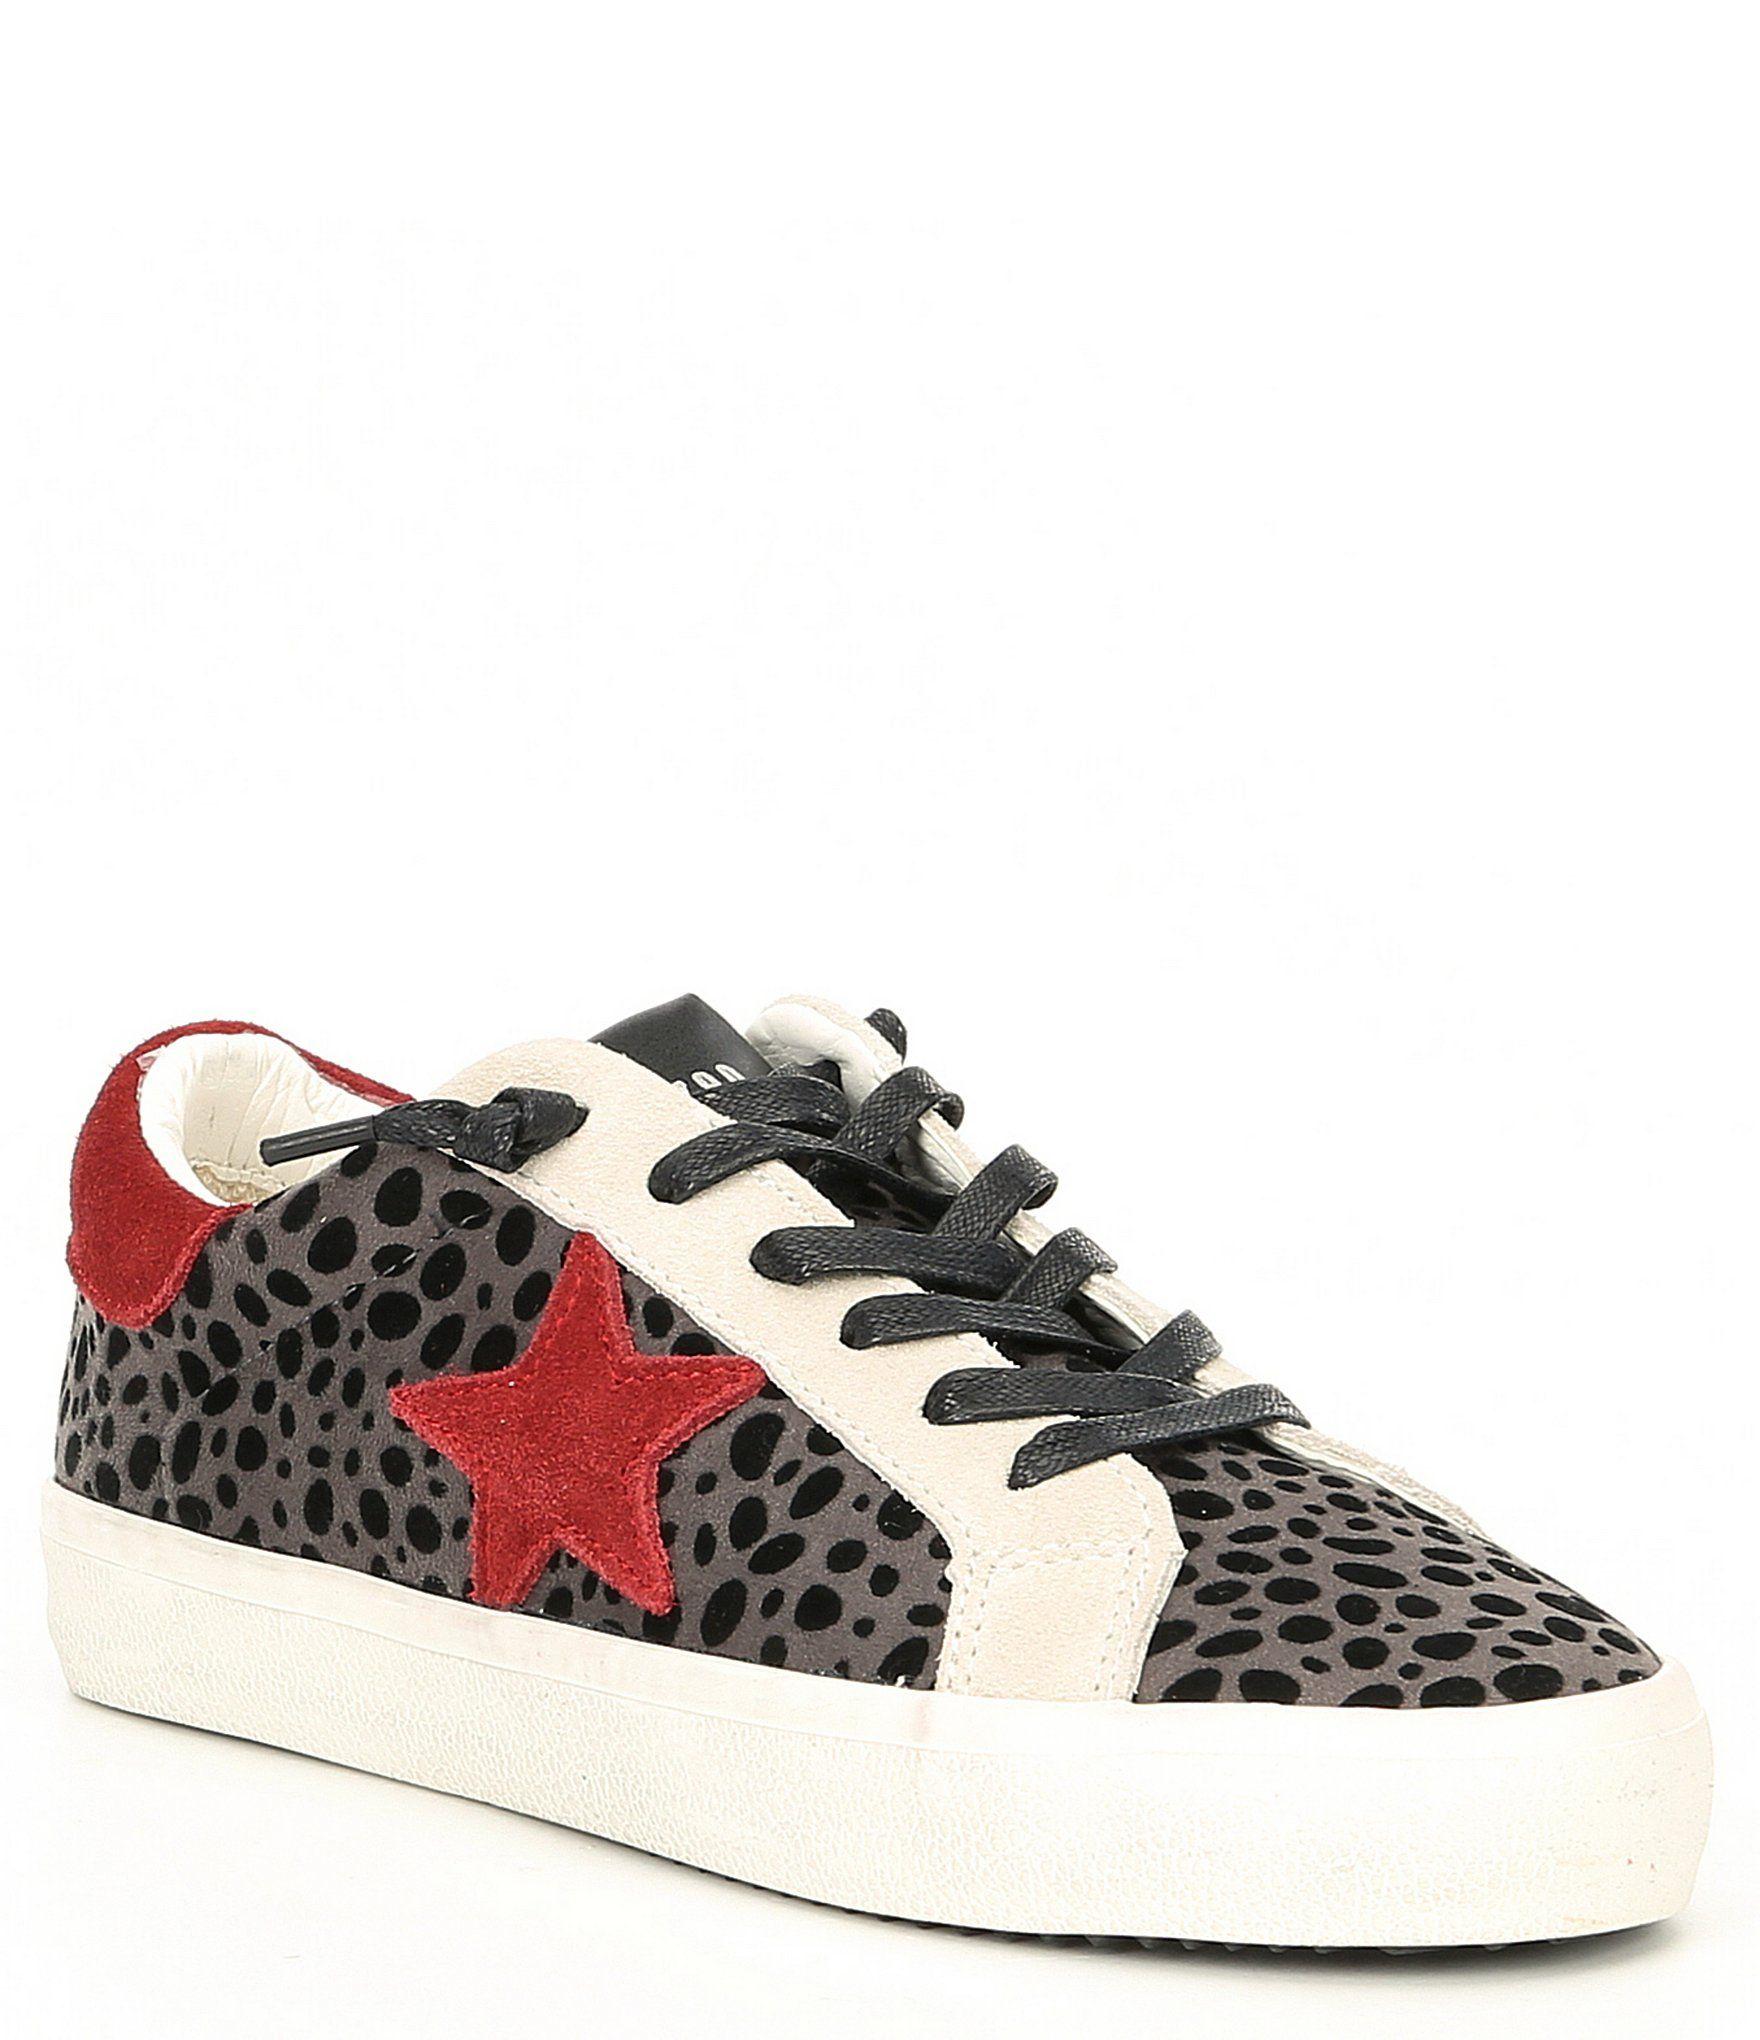 Steve Madden Philosophy Cheetah Star Print Sneakers Grey Multi 7 5m In 2021 Print Sneakers Star Print Splendid Shoes